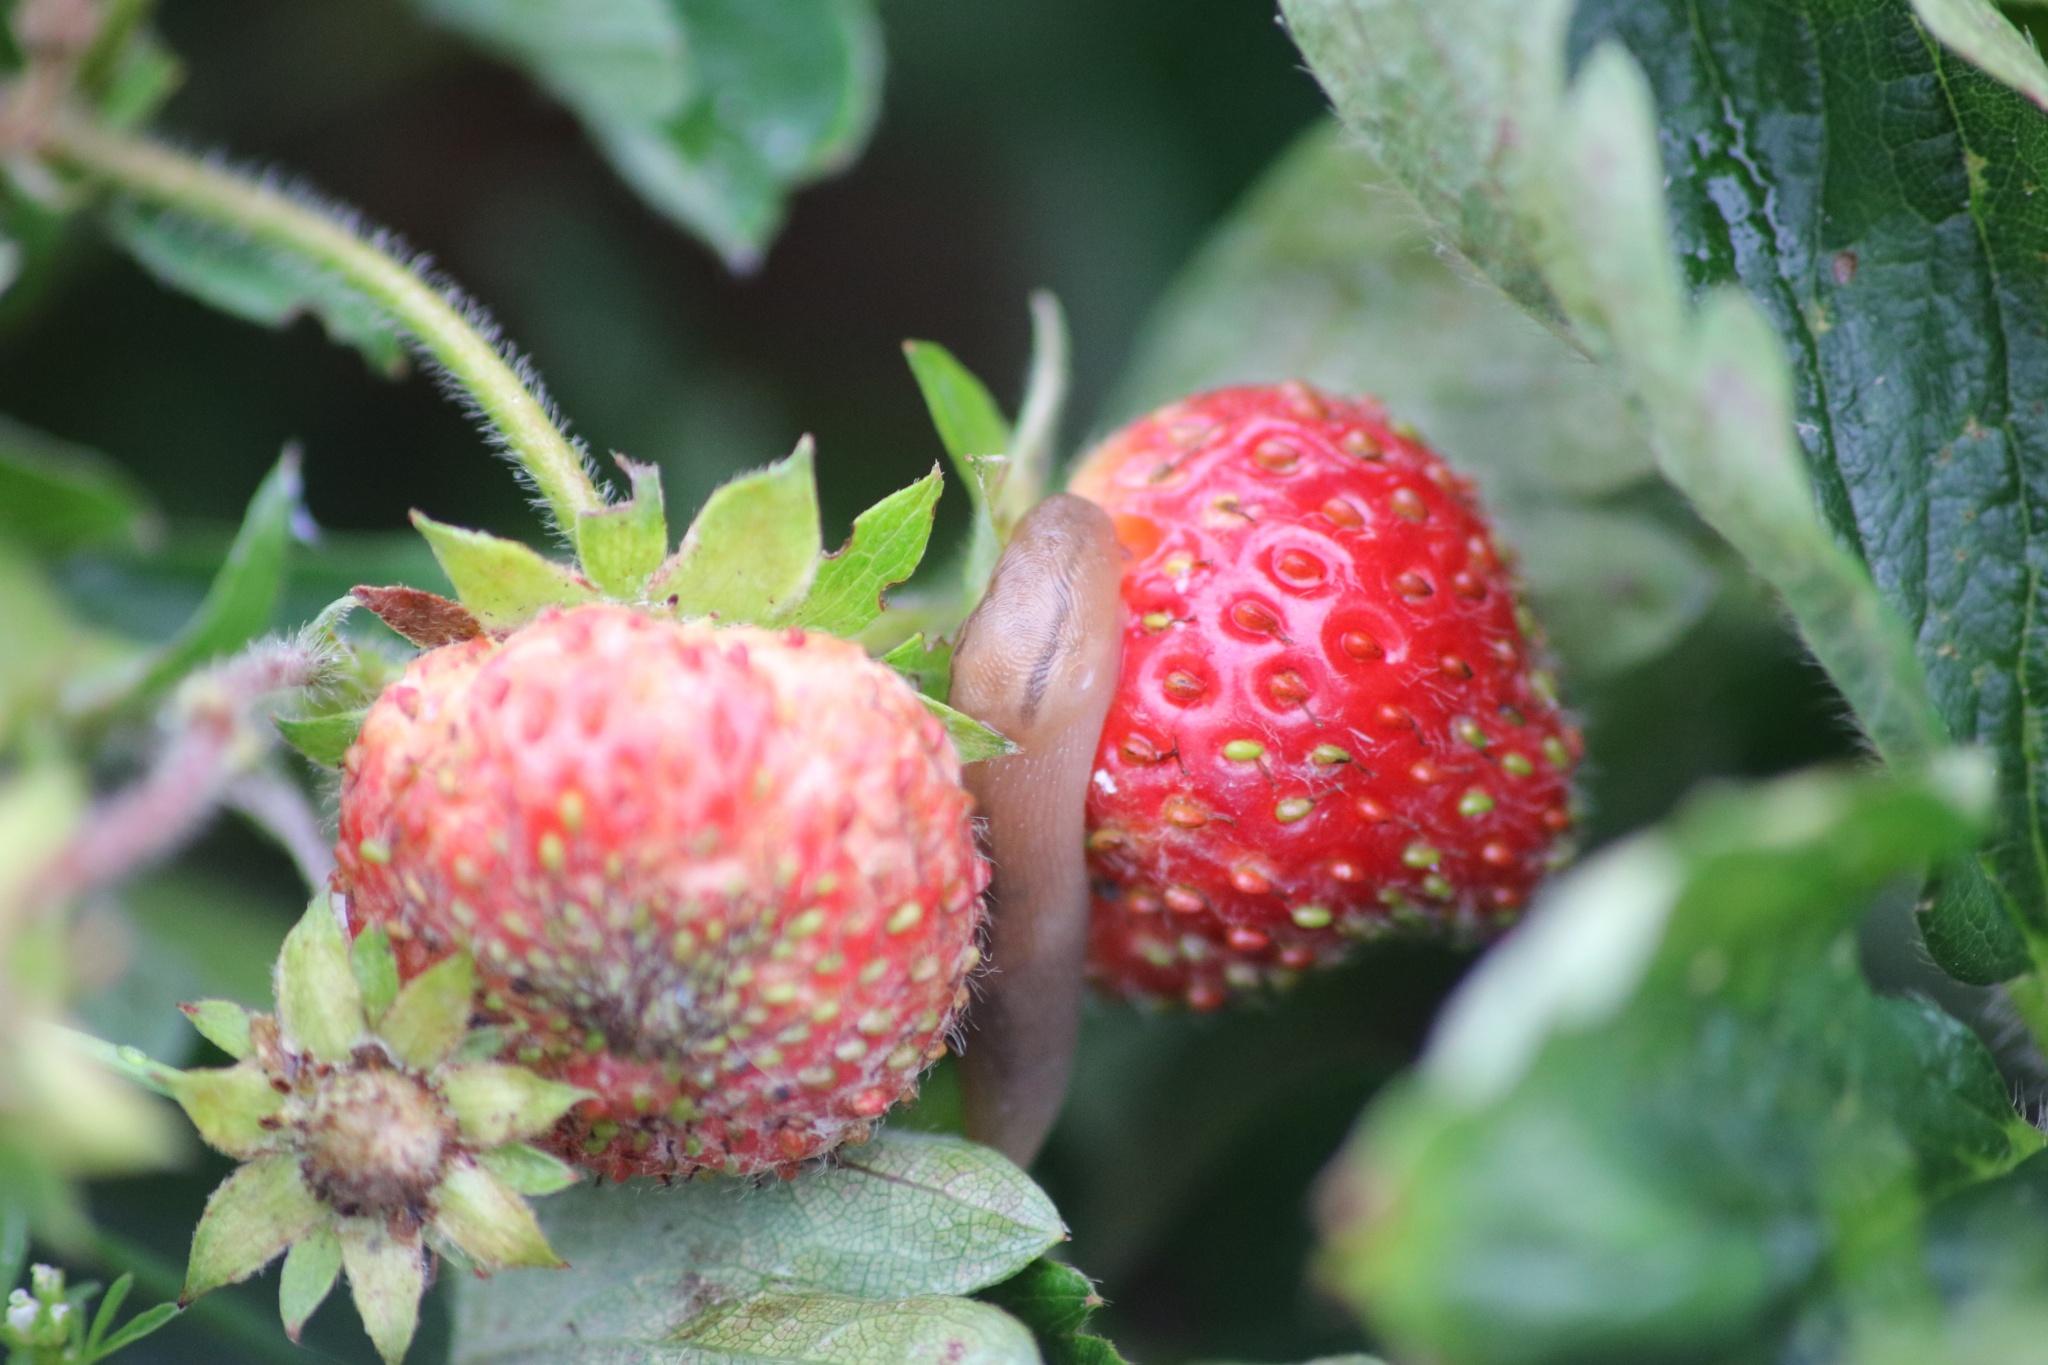 slug on strawberry  by Josephine